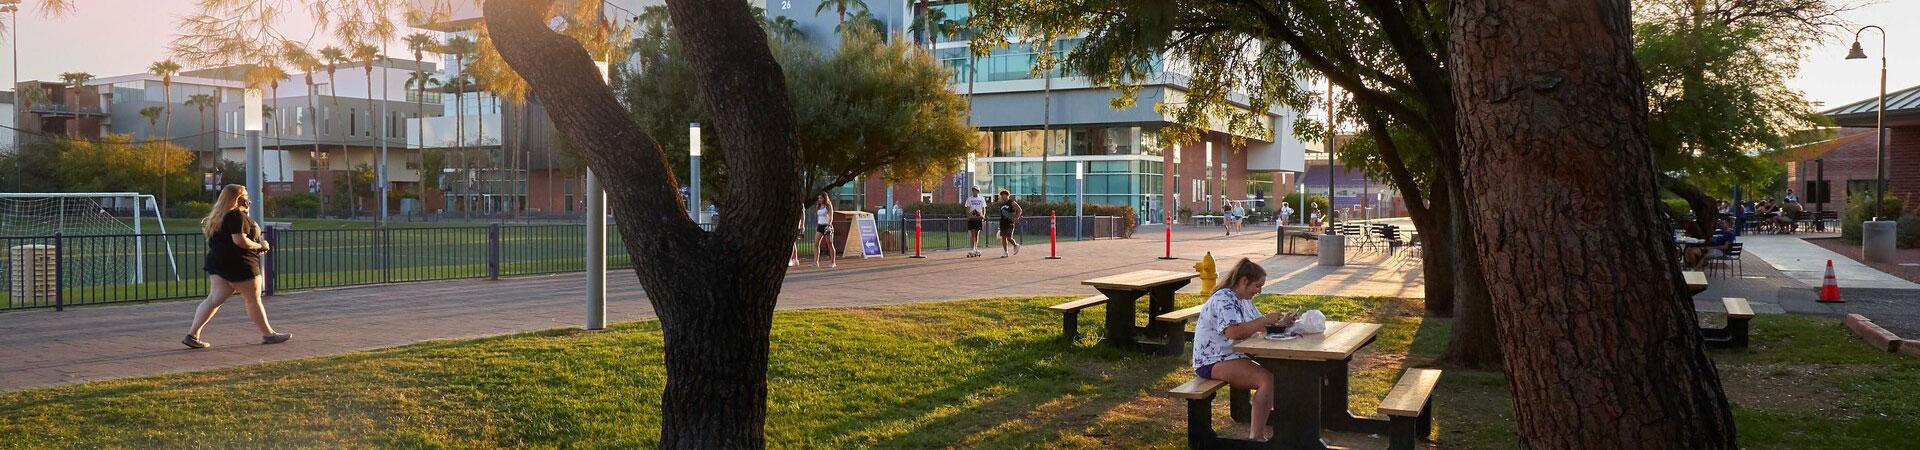 GCU Campus with students walking around